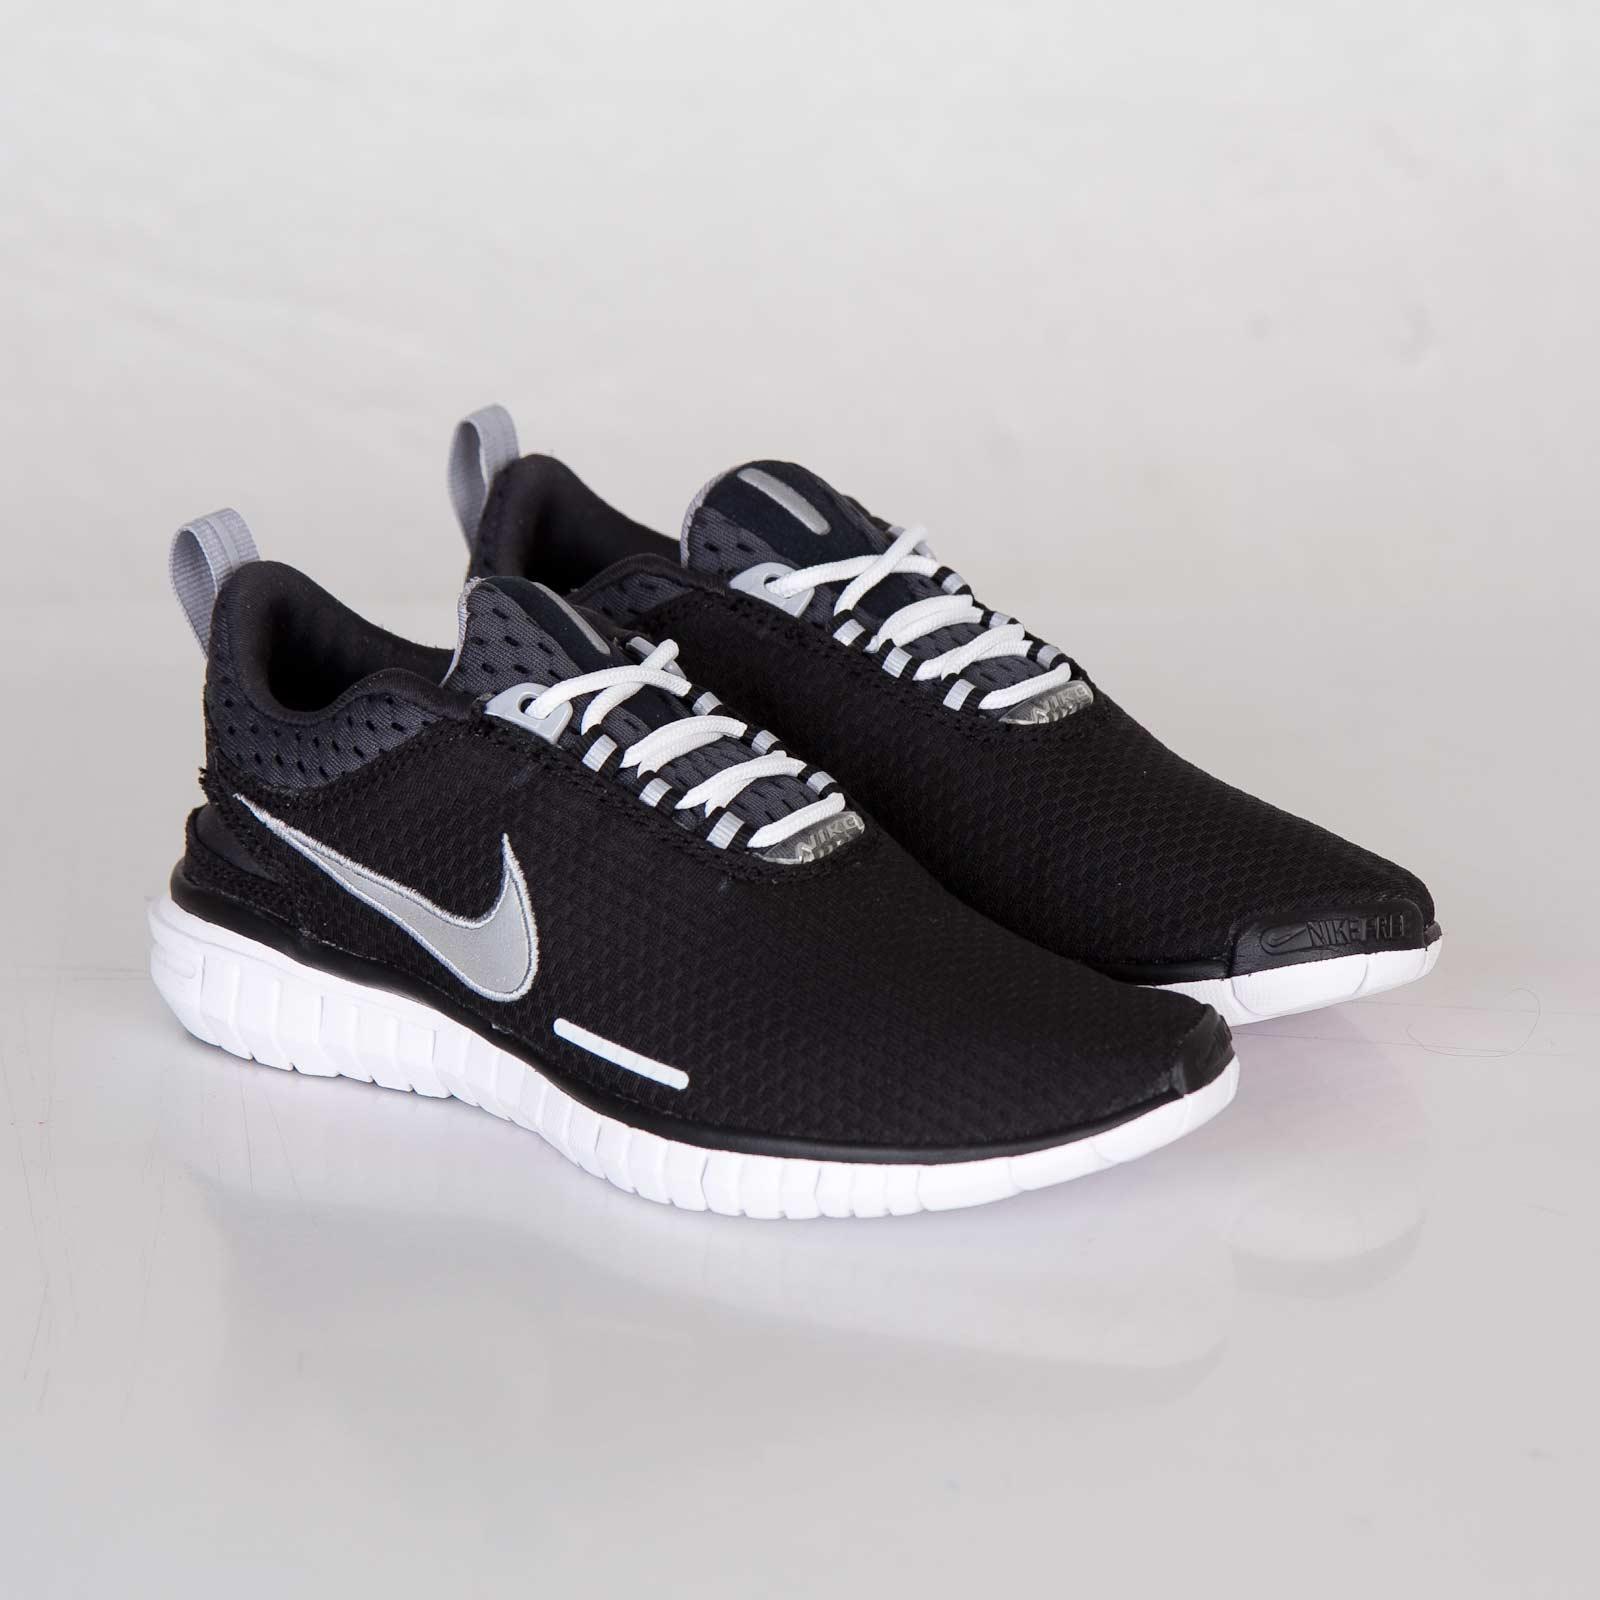 nike free og 14 br Nike Wmns Free OG 14 BR - 644450-001 - Sneakersnstuff   sneakers ...